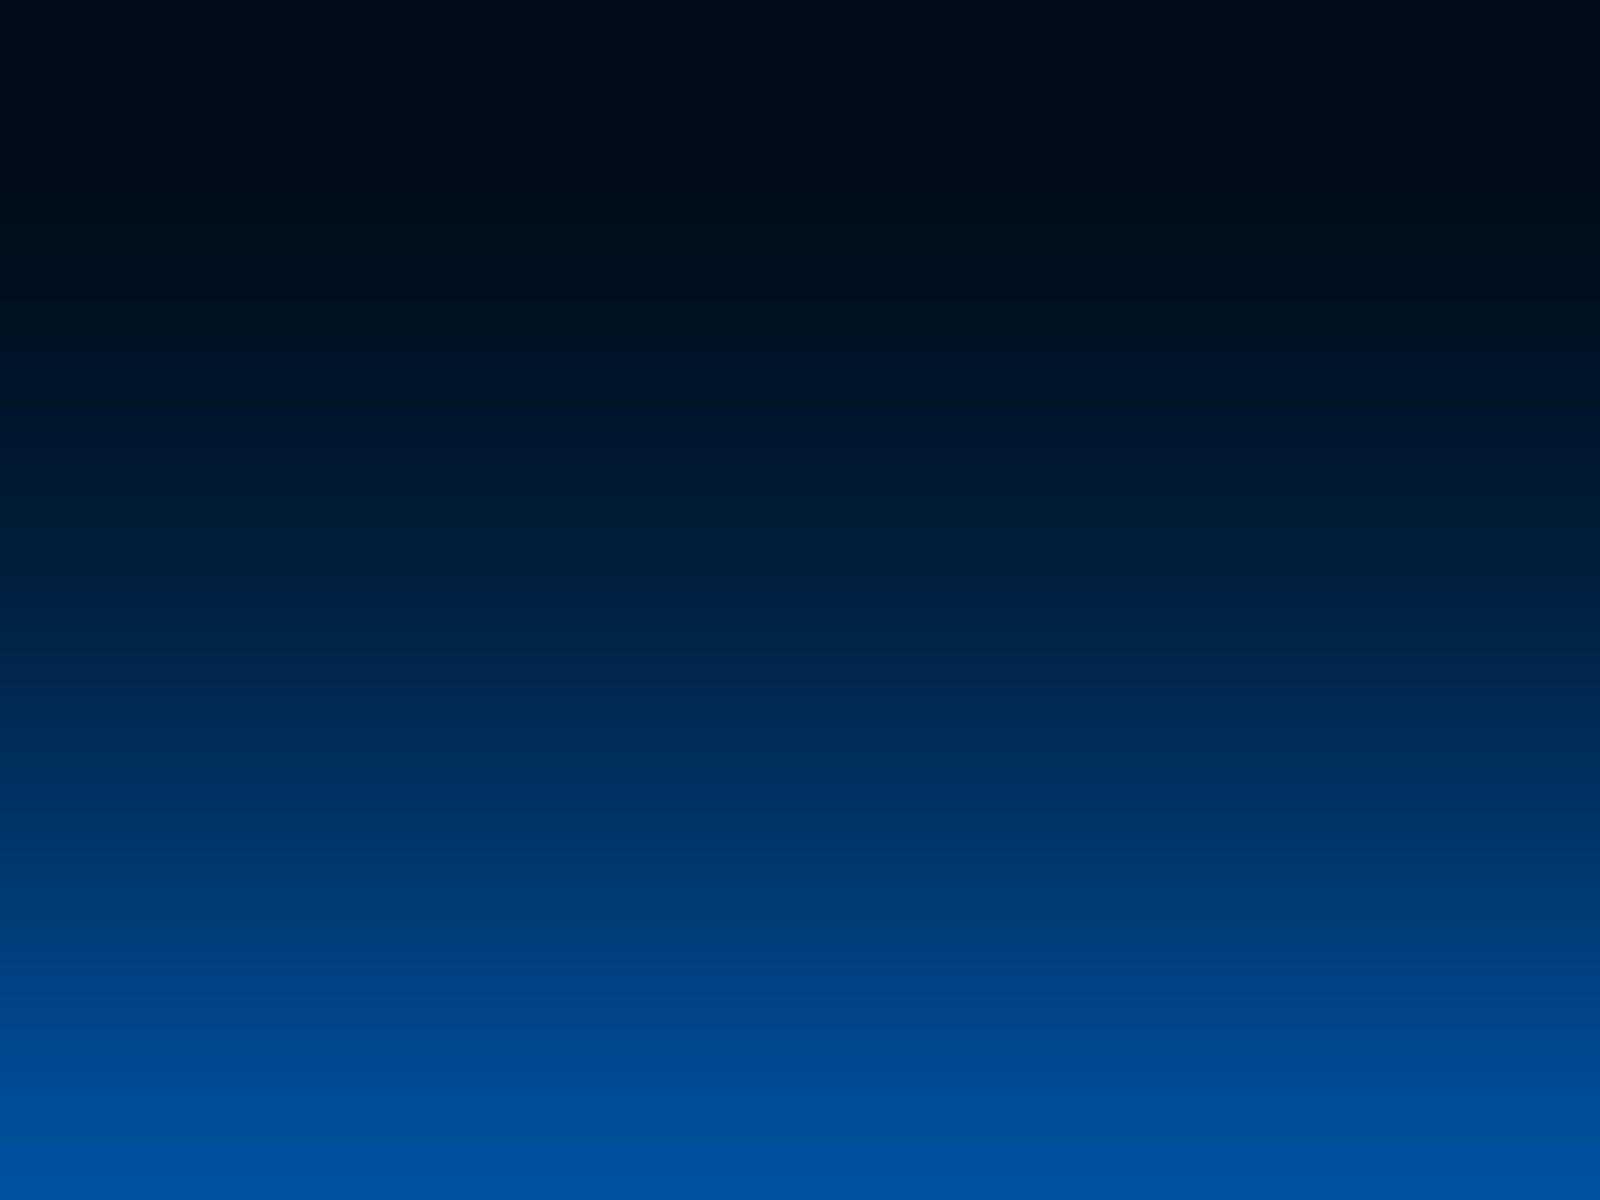 Blue Gradient Background   wallpaper 1600x1200